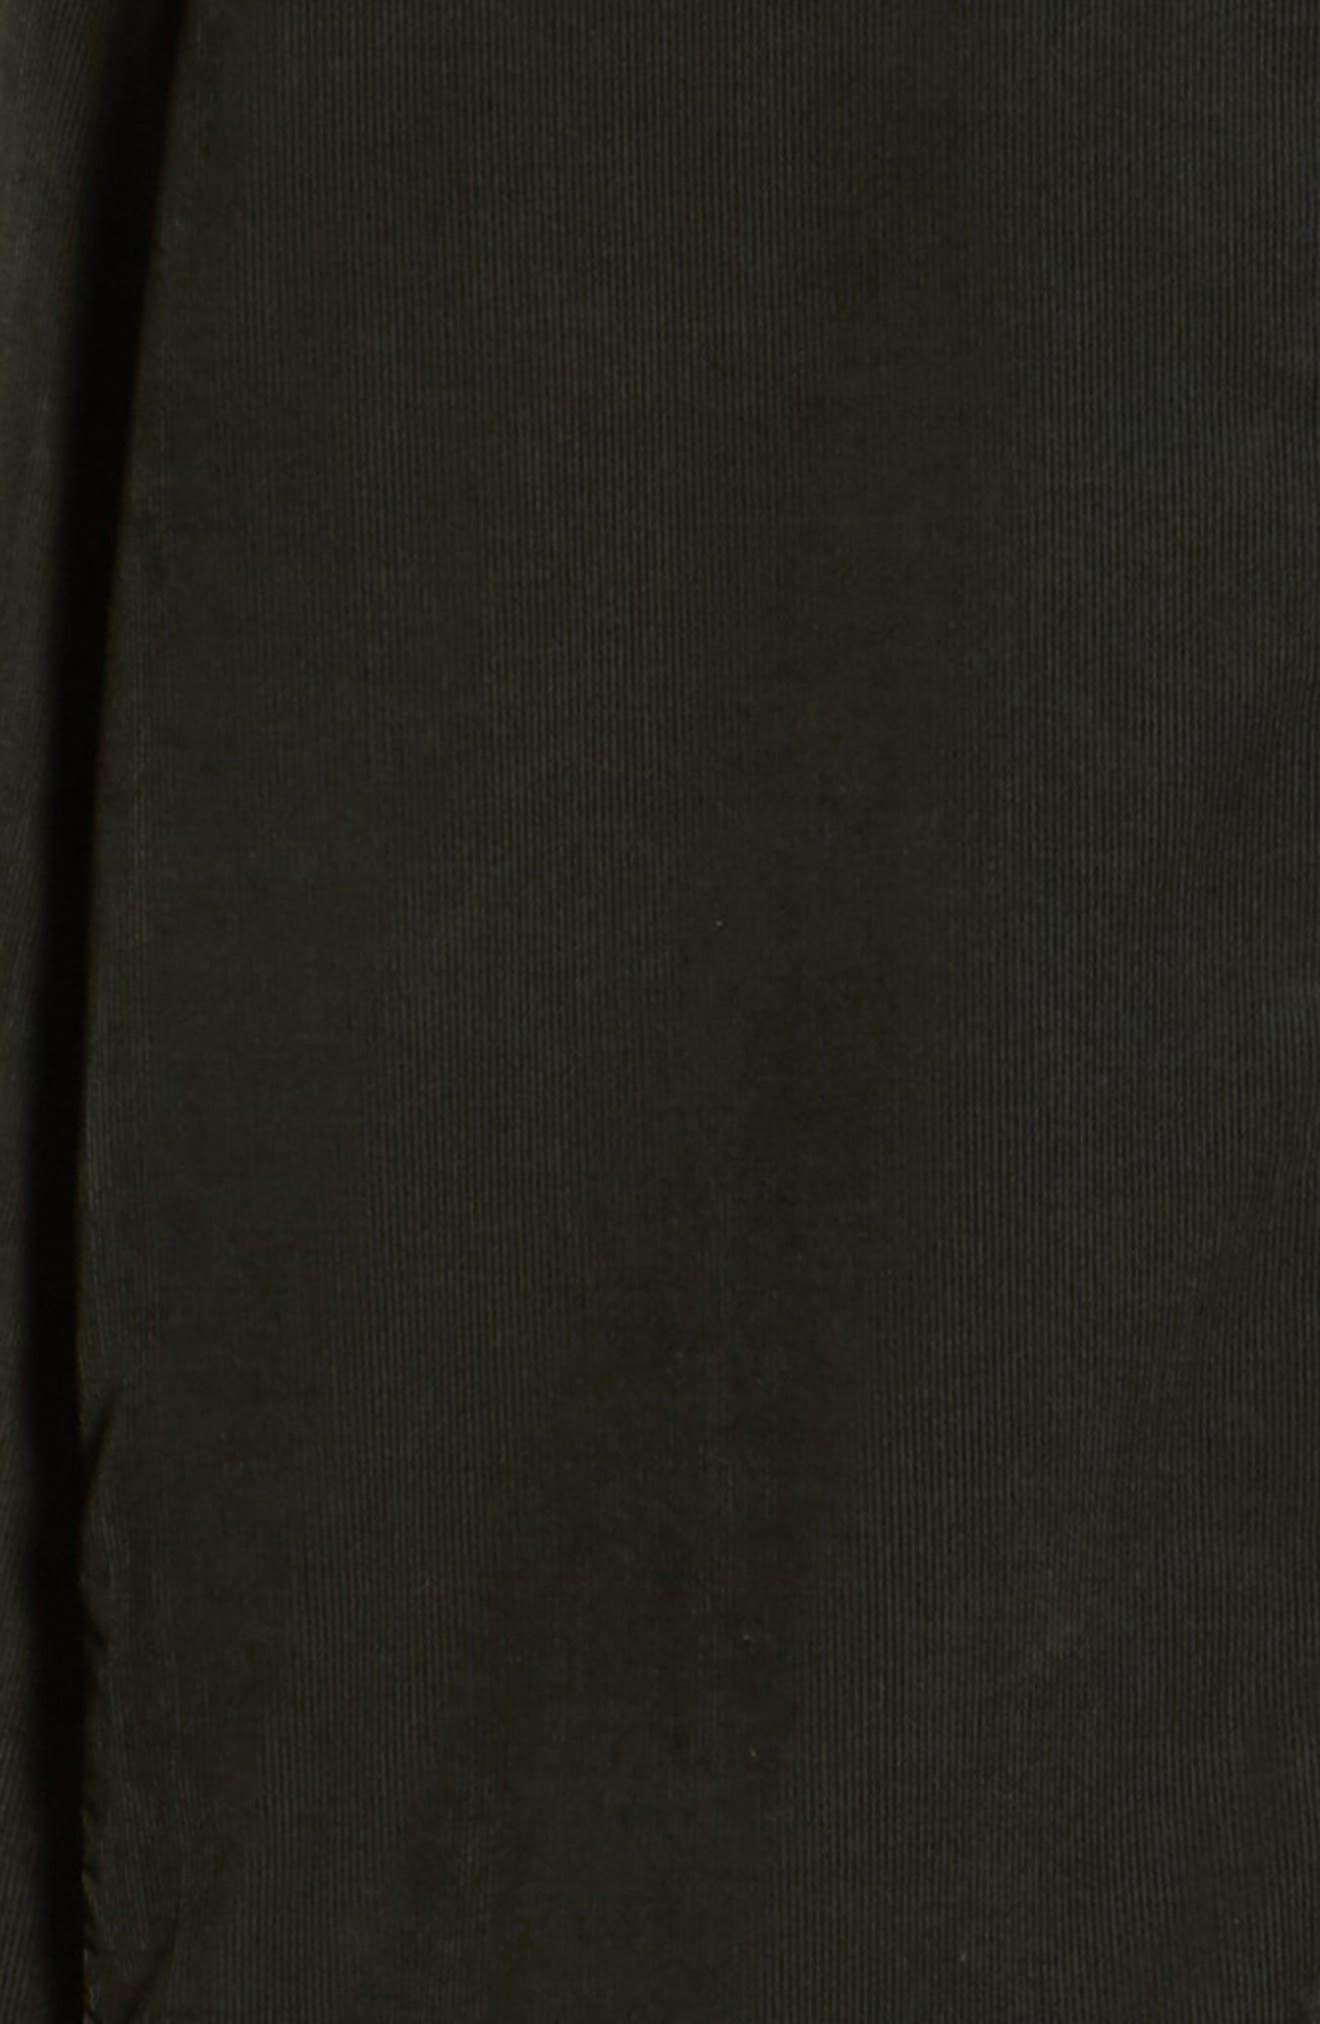 Slim Fit Corduroy Shirt,                             Alternate thumbnail 6, color,                             001